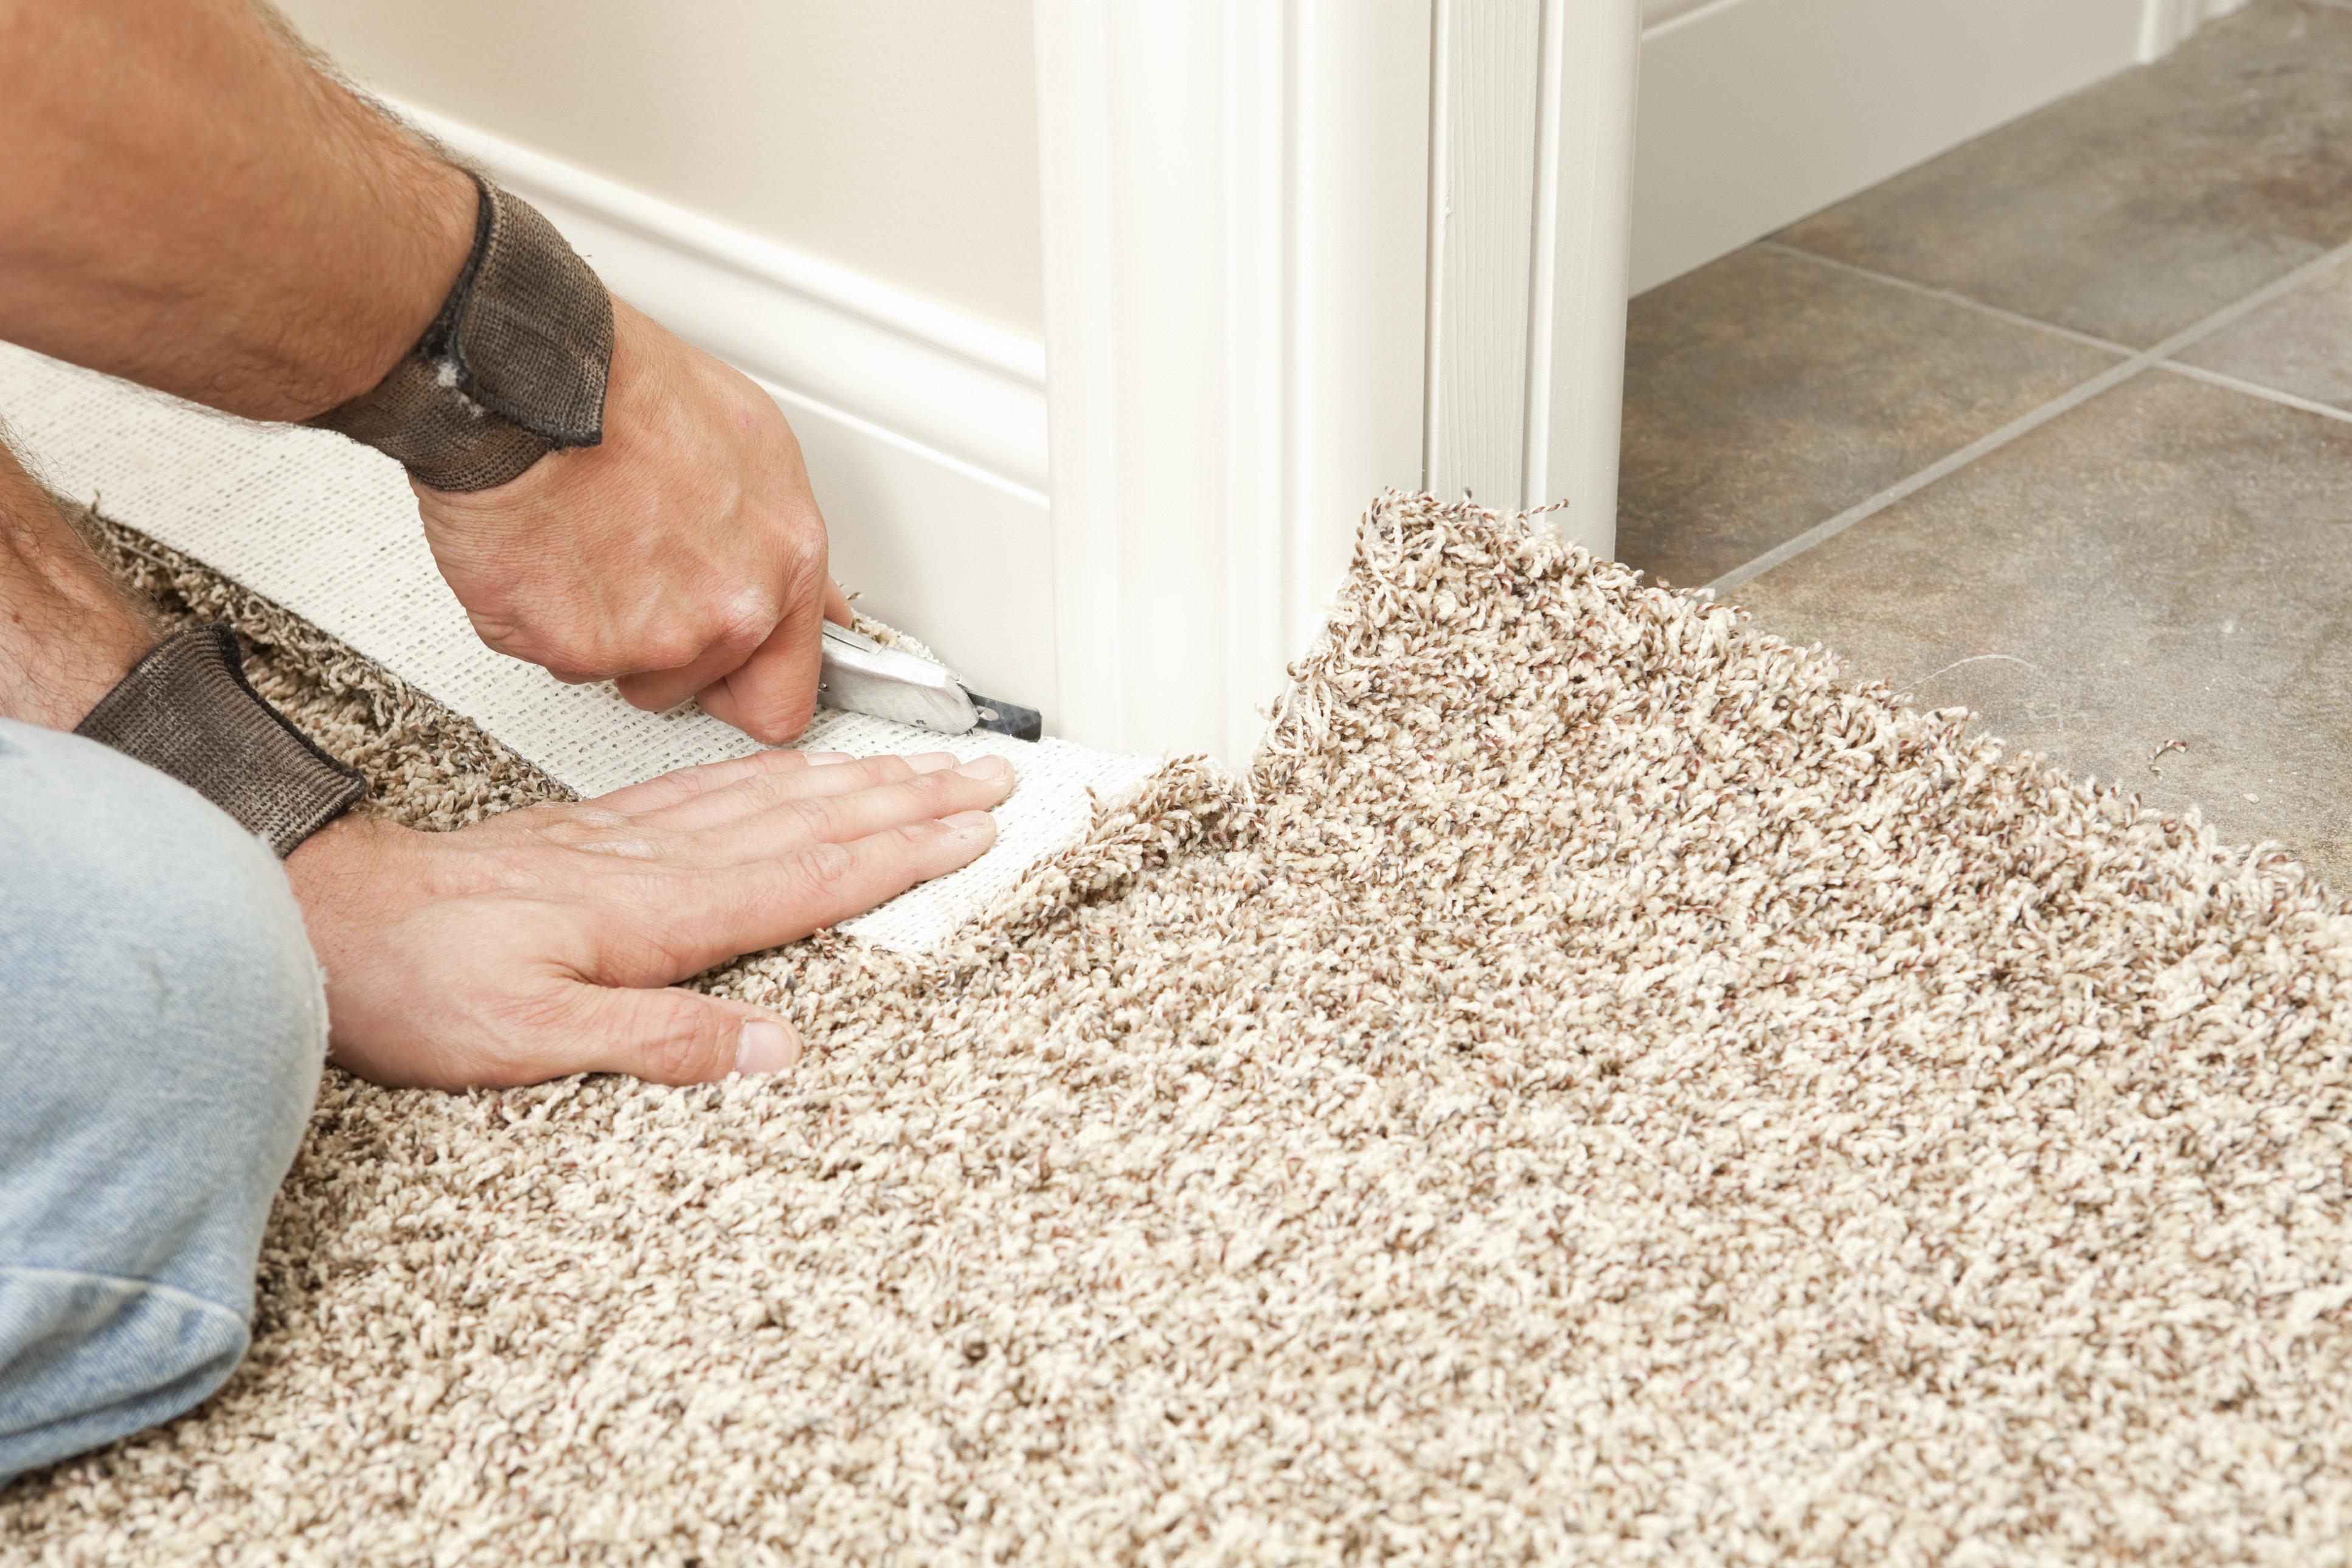 Carpet Installer Using Knife to Trim Wall Edge